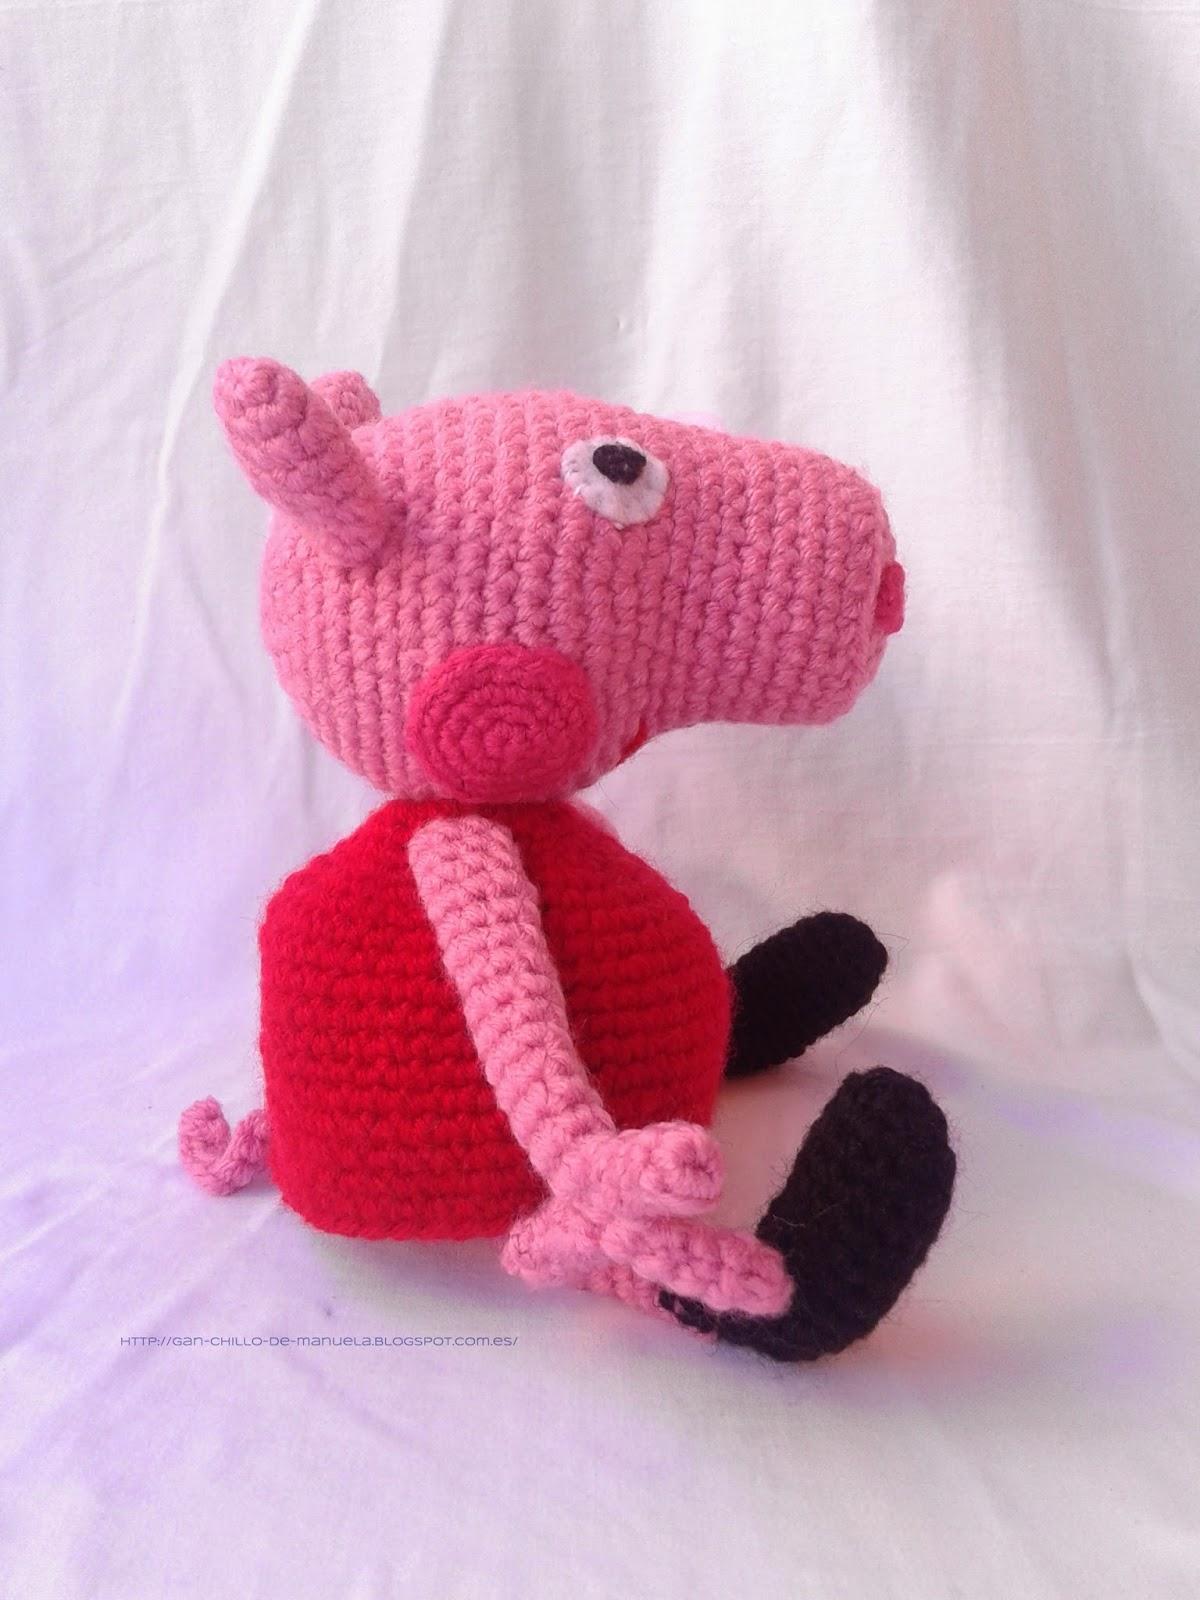 GAN-CHILLO: PEPPA PIG